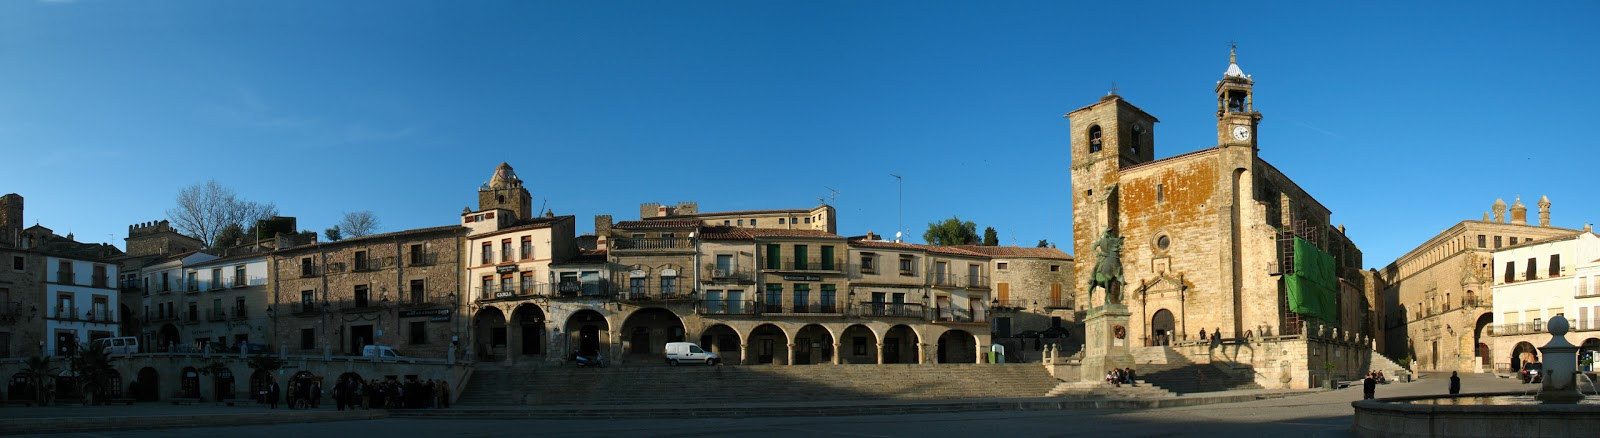 Spanje reizen trujillo stad van veroveraars for Oficina turismo badajoz